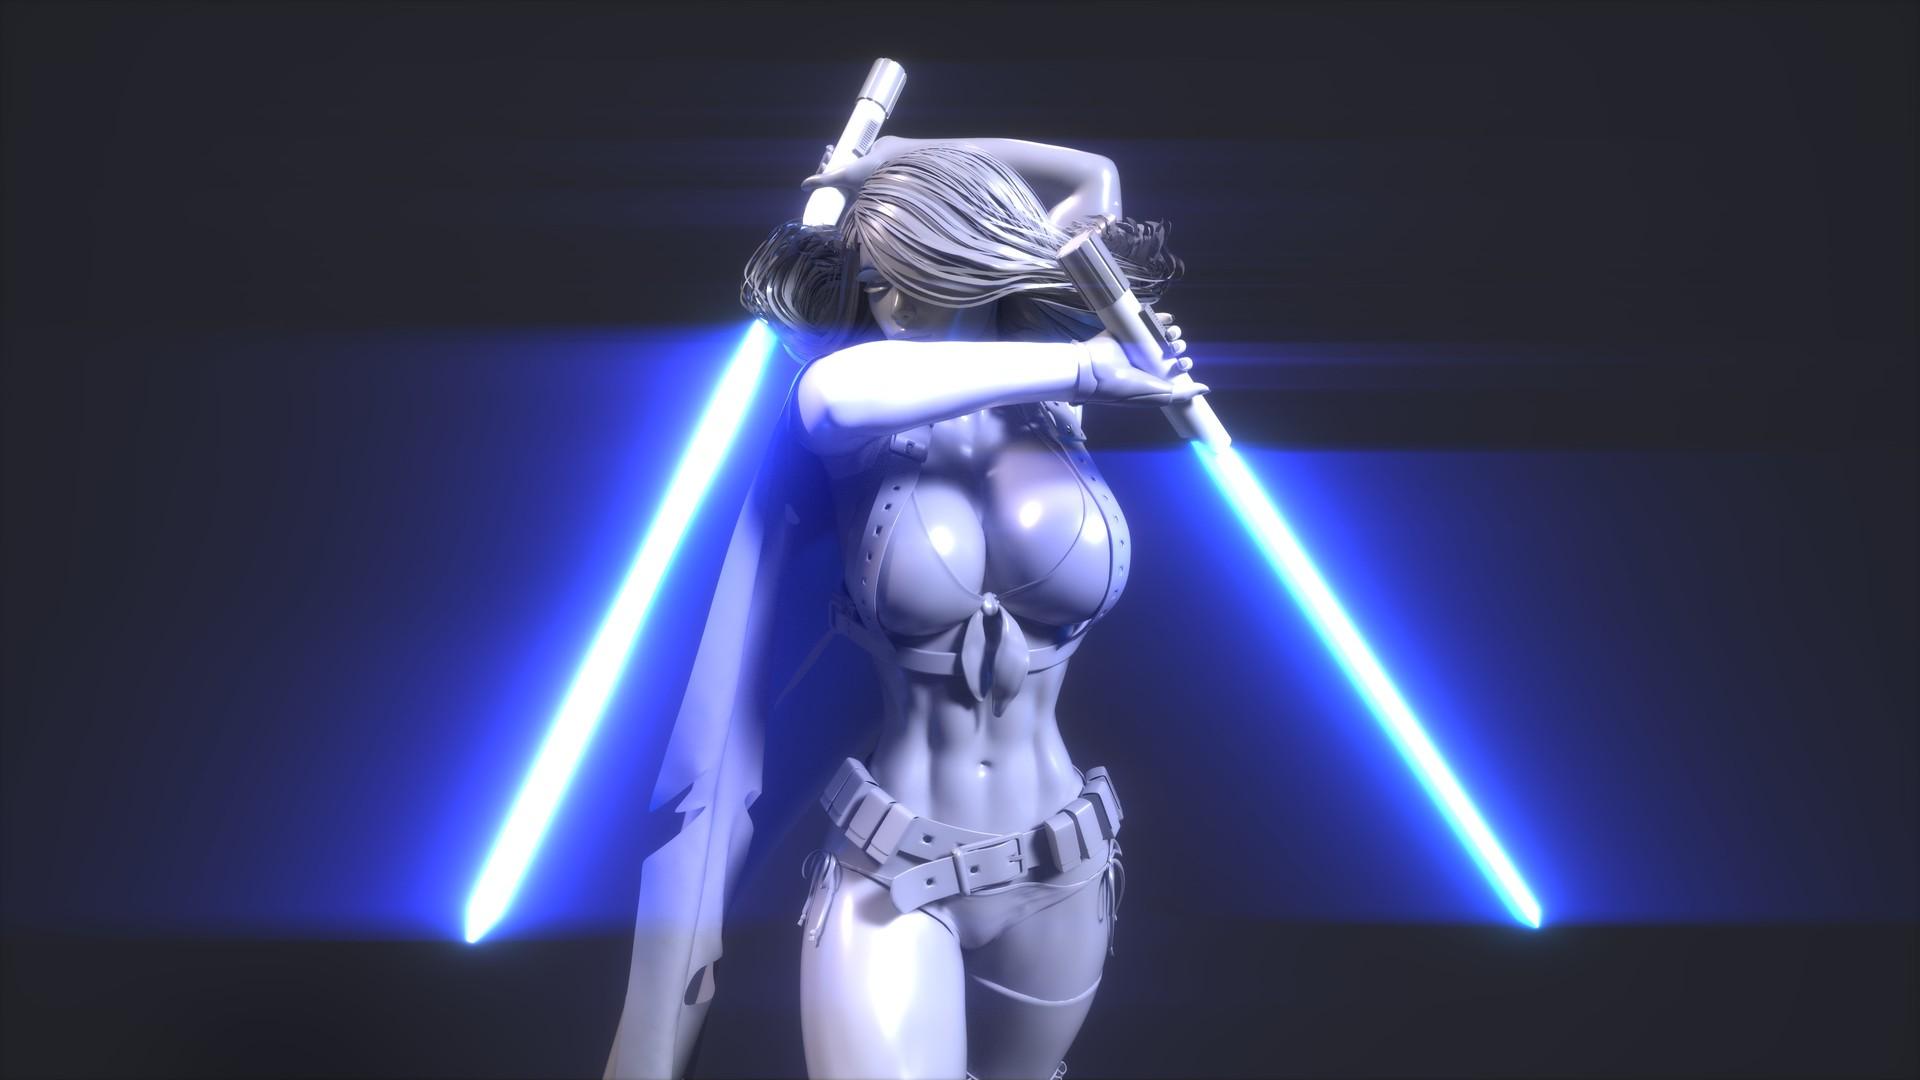 Star wars sex pic sexy scene